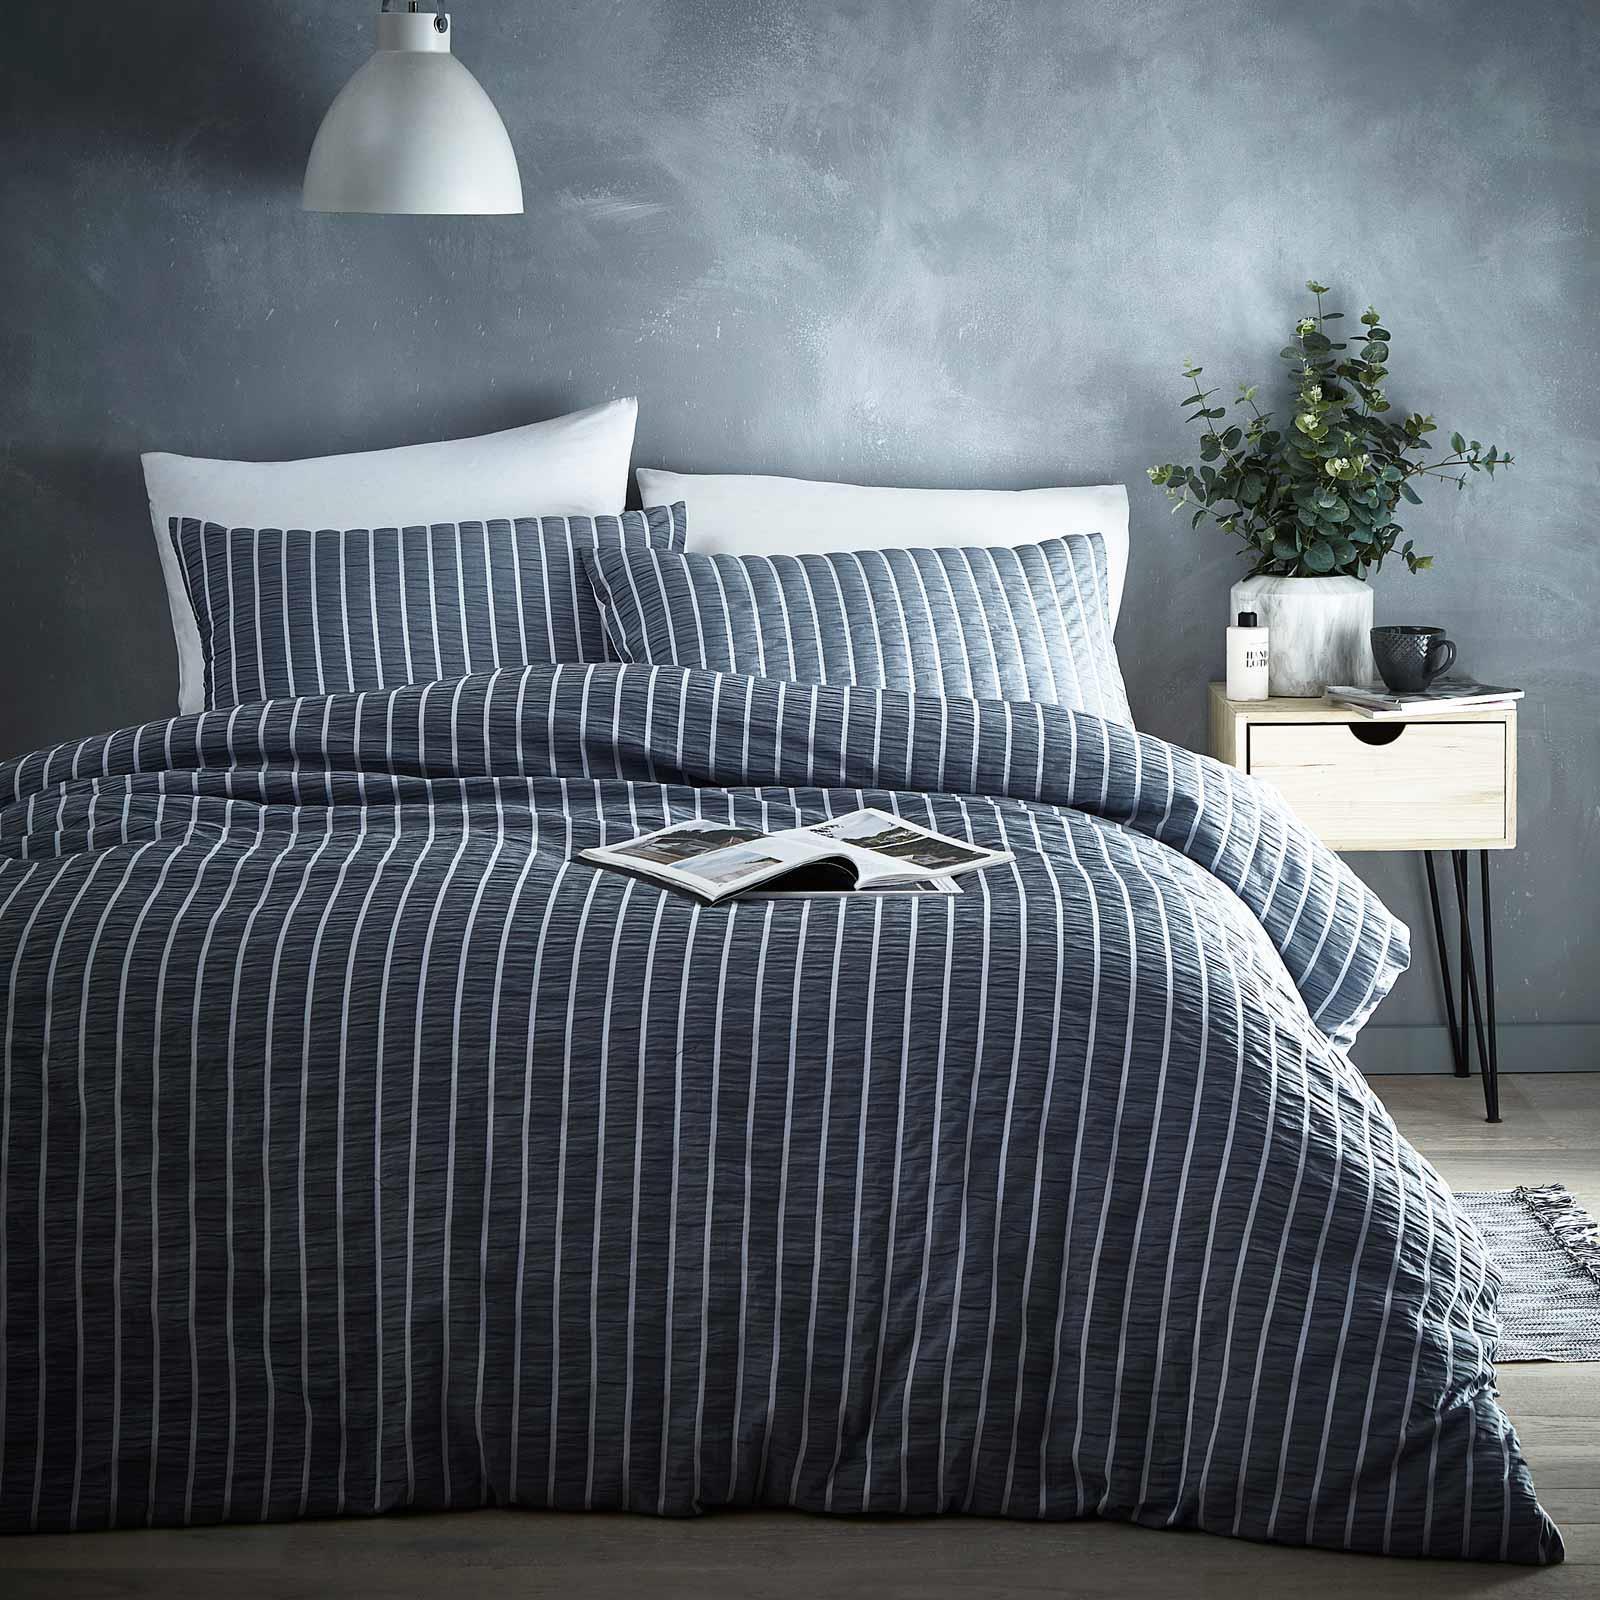 Grey Duvet Covers Seersucker Stripe Ruched Modern Quilt Cover Bedding Sets Ebay